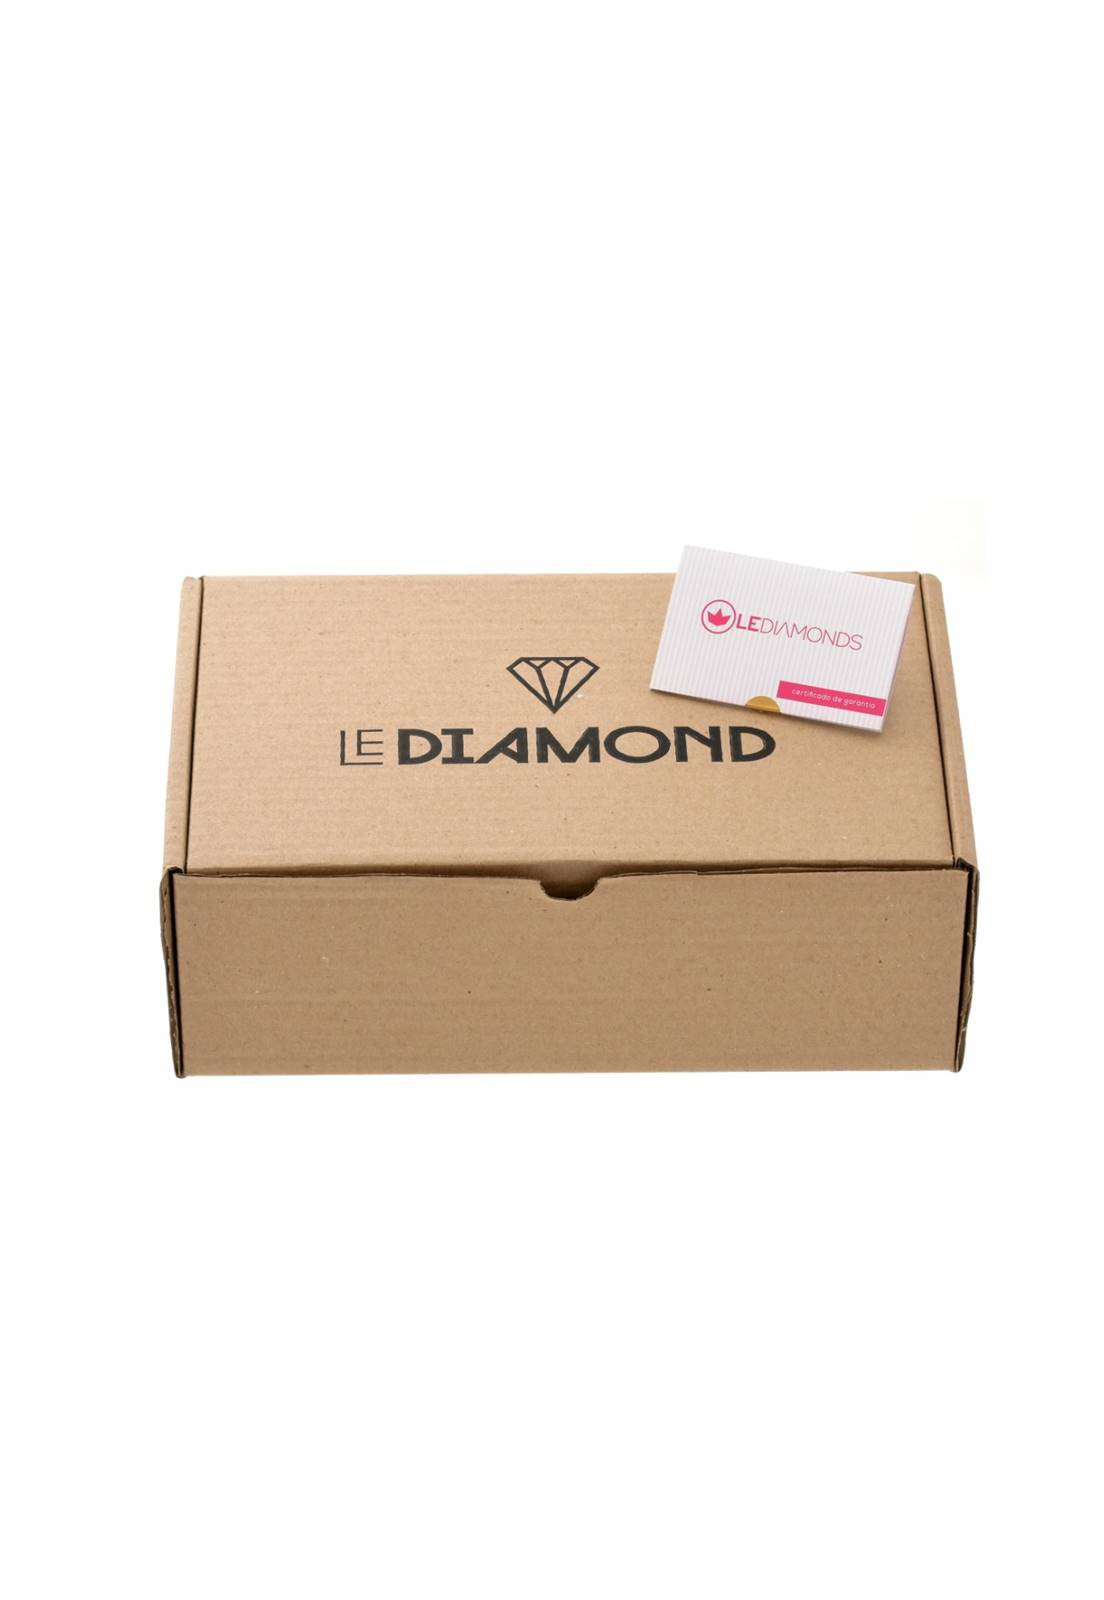 Brinco Le Diamond Festa Dourado com Pedras